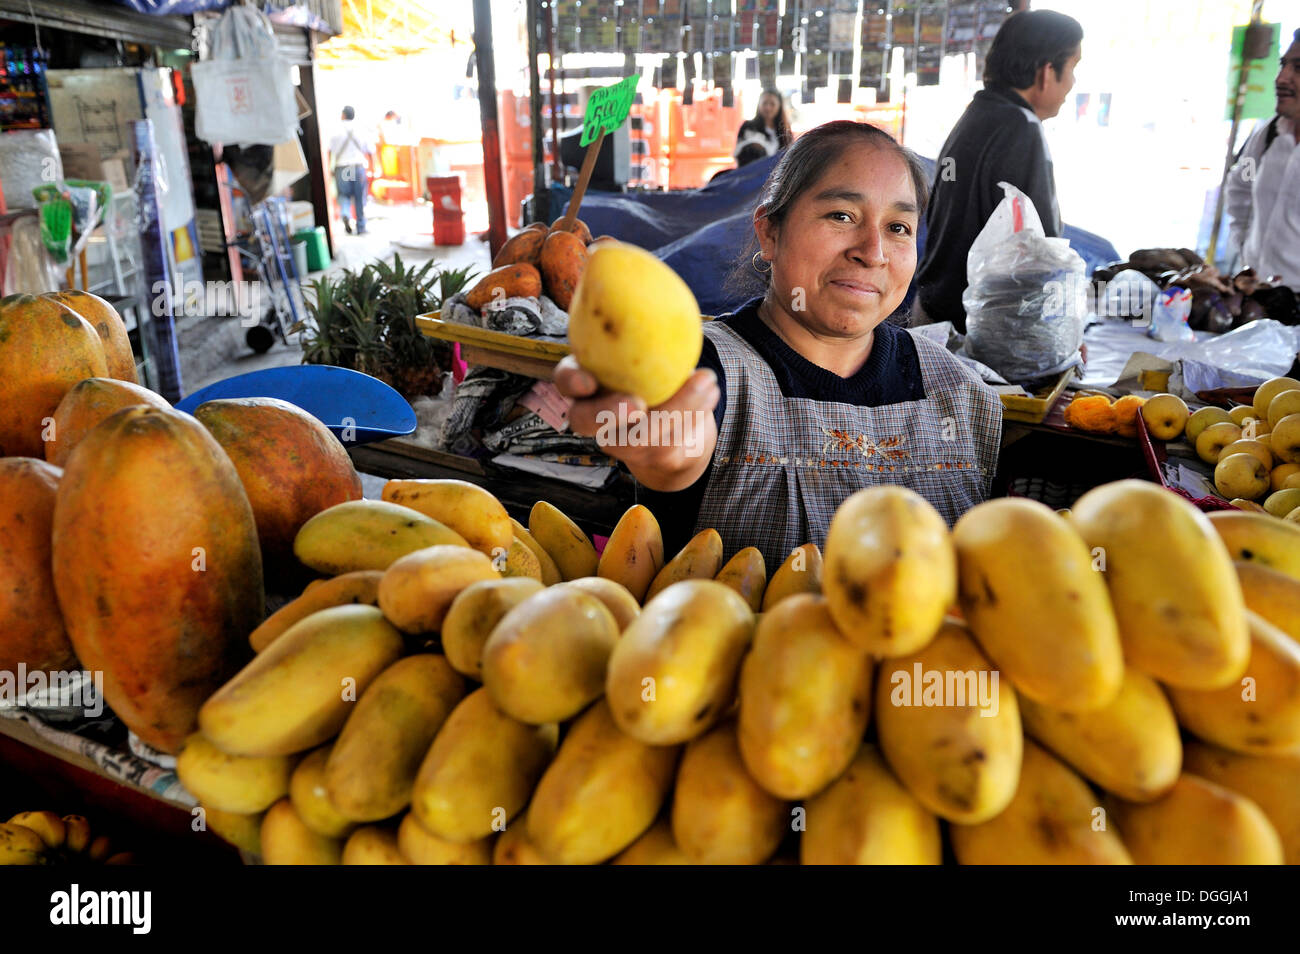 Food Market Mexico Mango Stock Photos & Food Market Mexico Mango ...